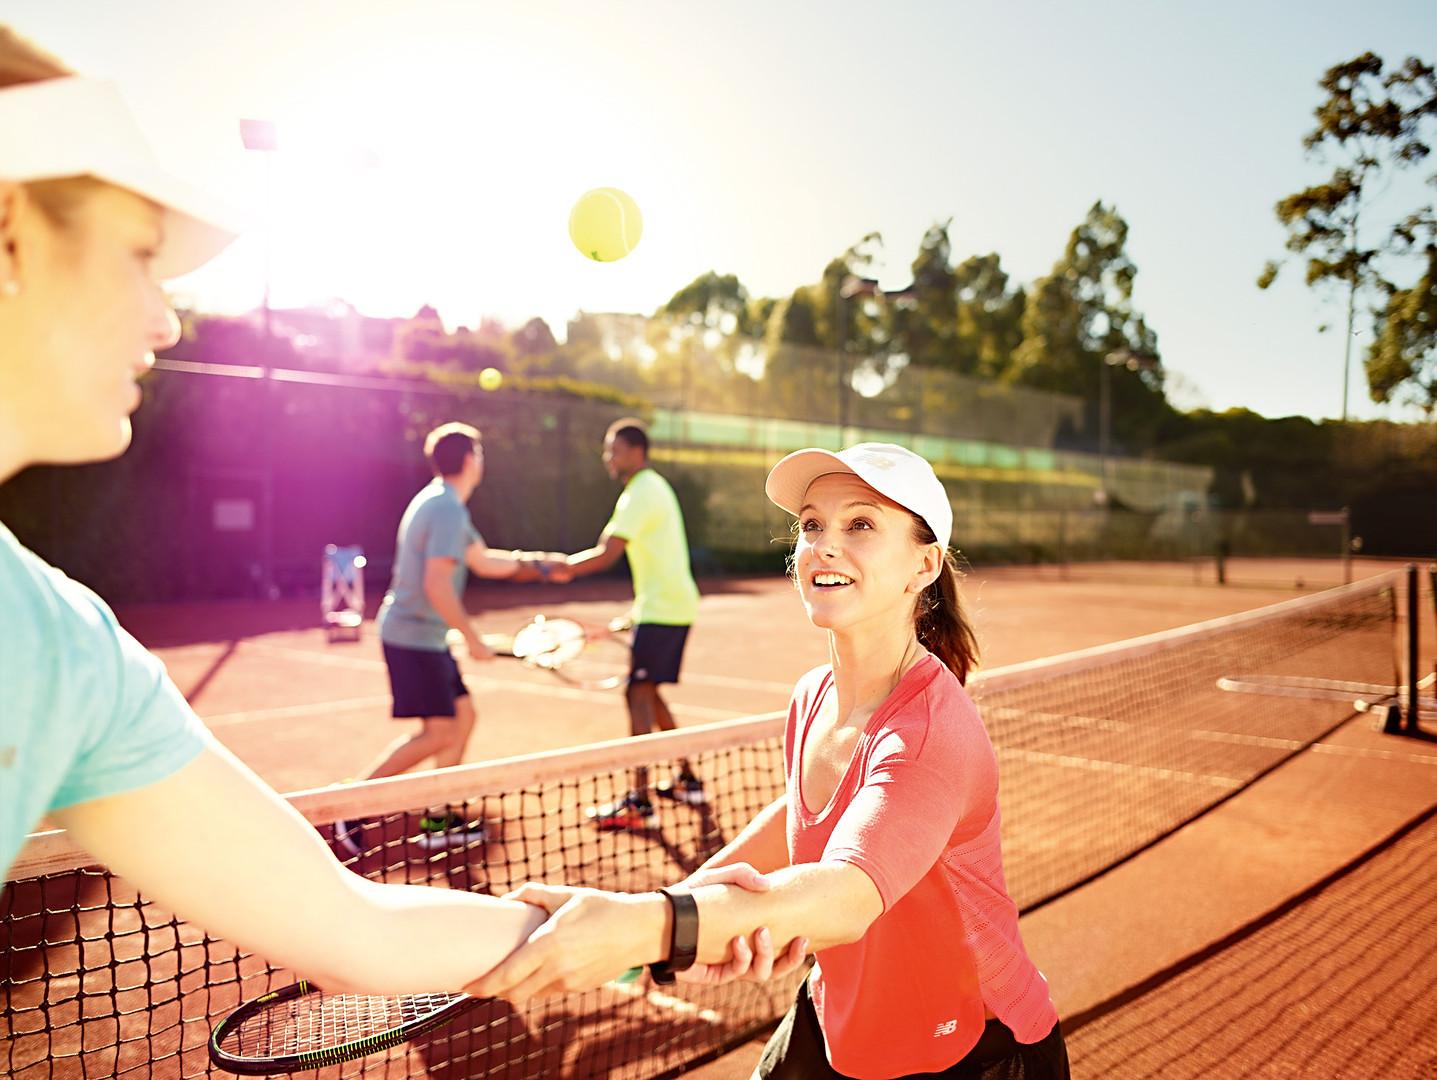 Fitbit Cardio Tennis Image4.jpg